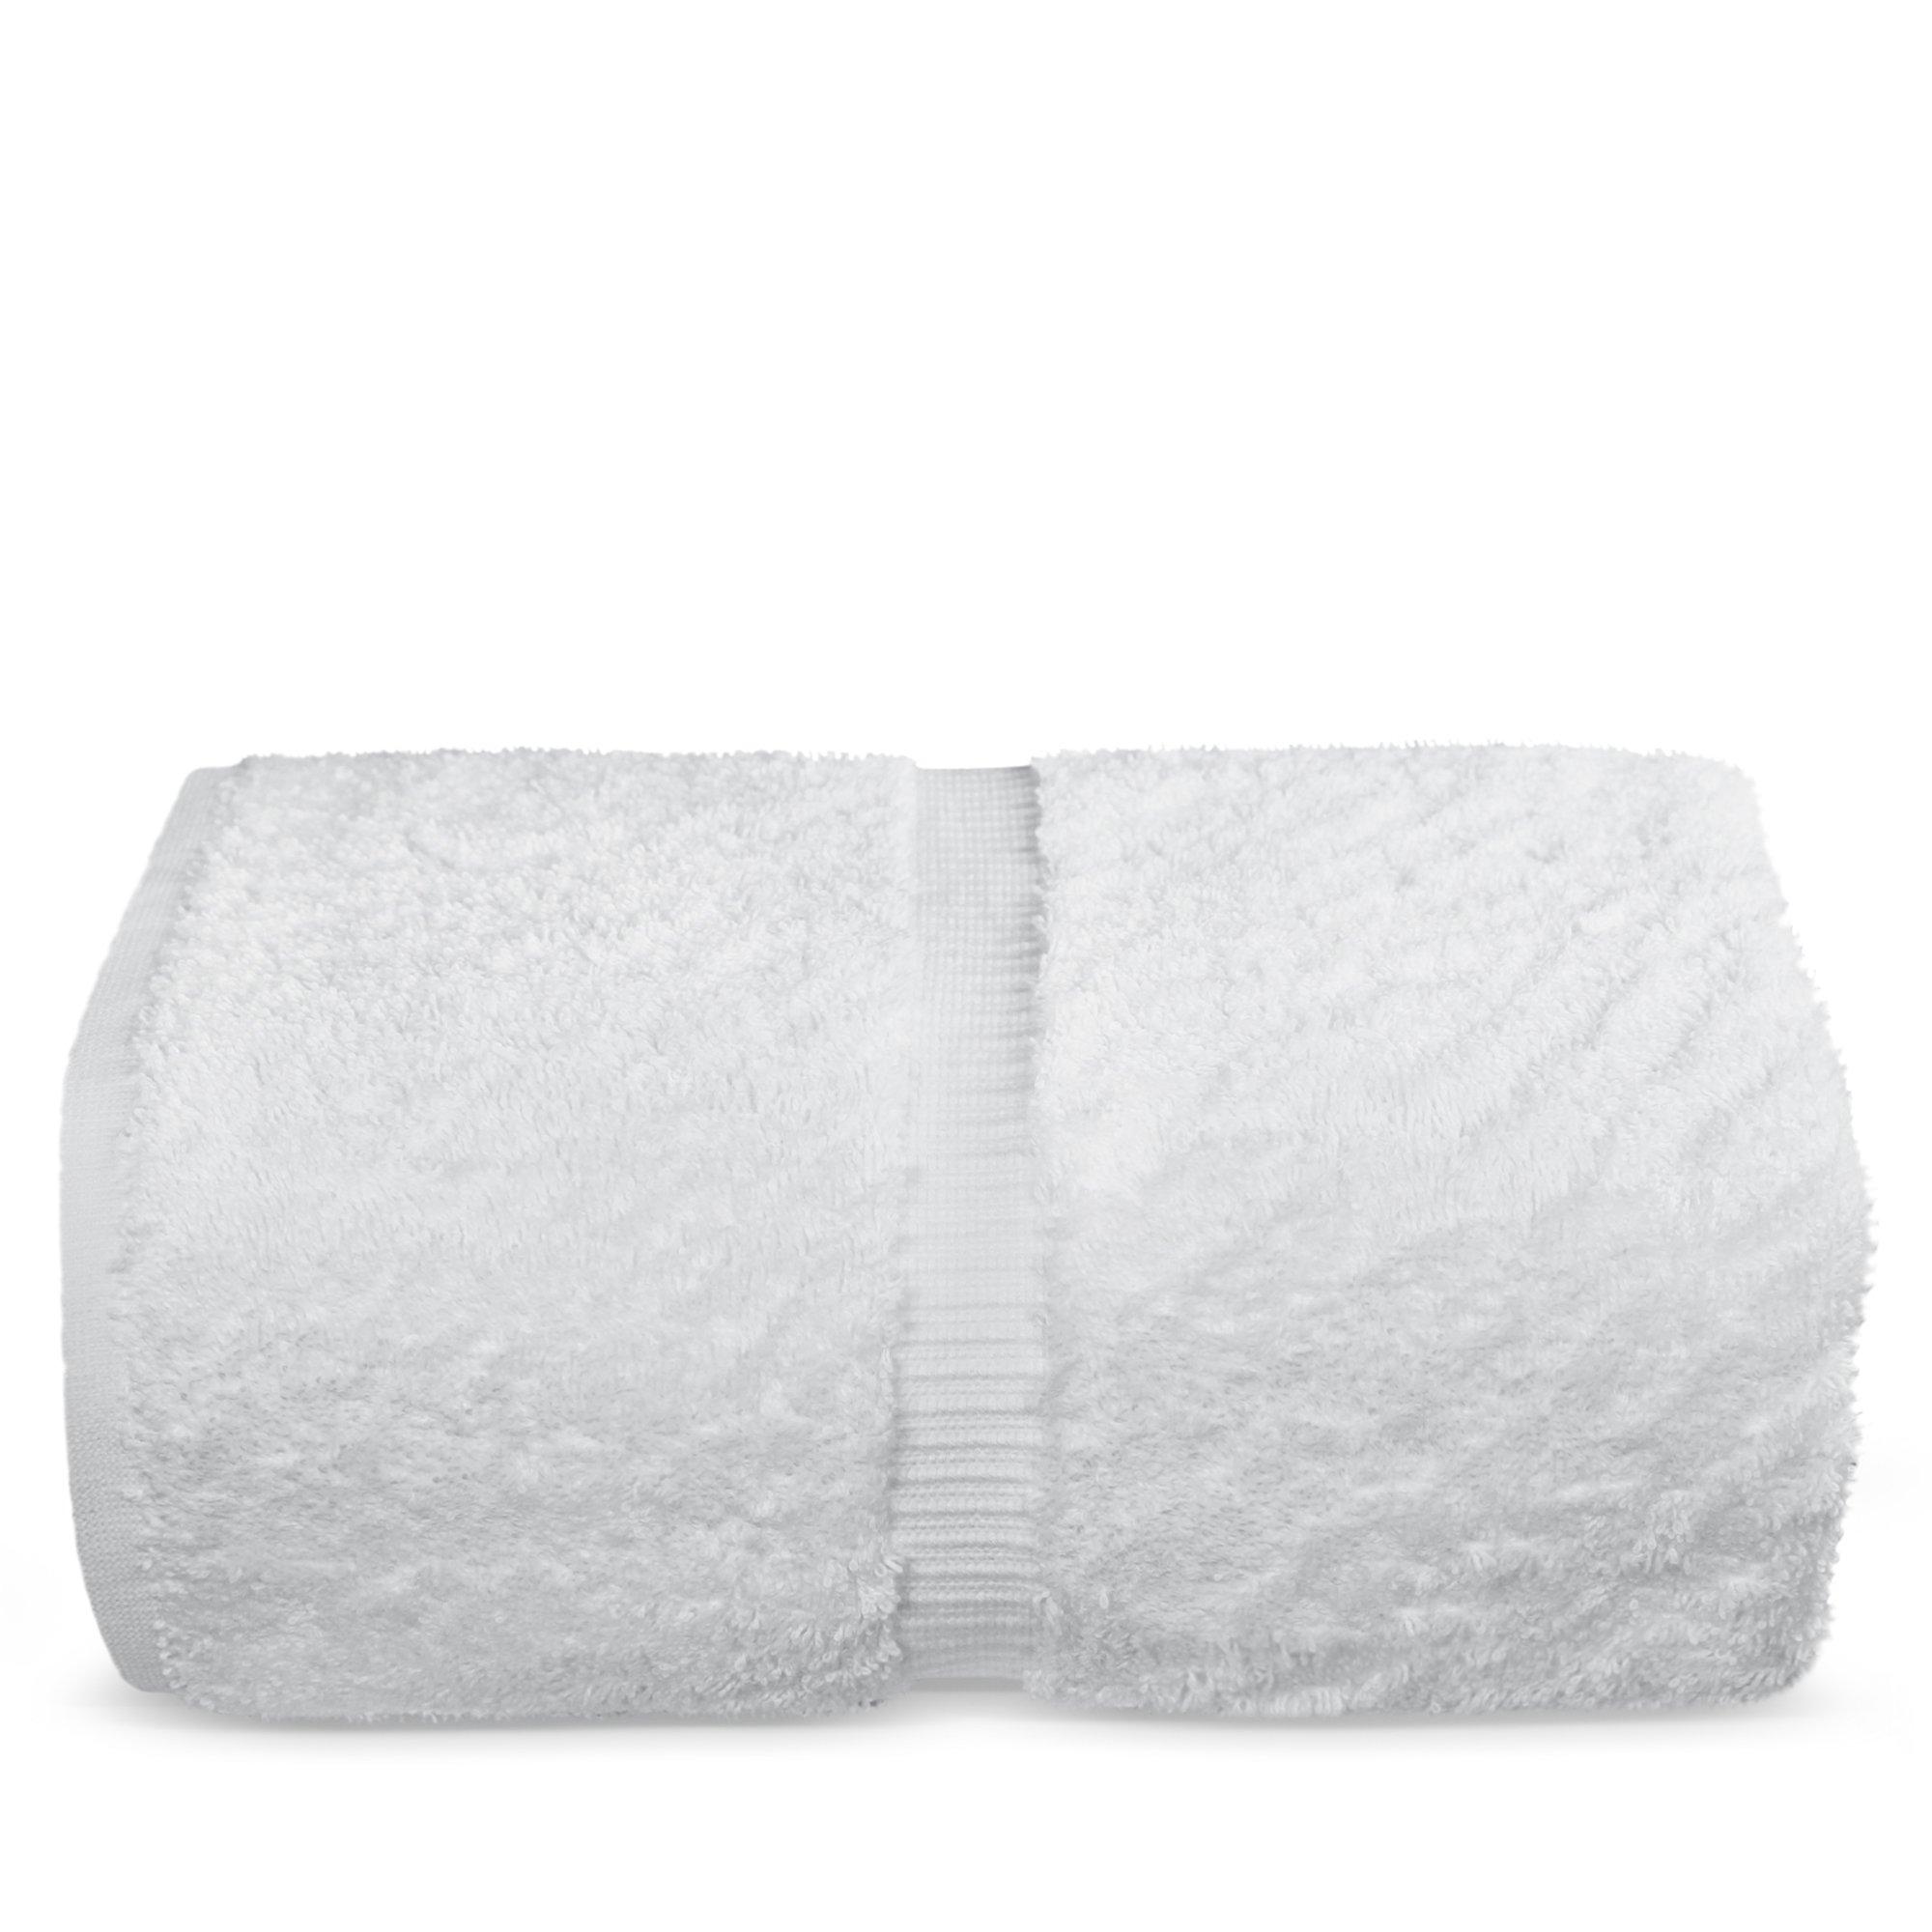 Indulge Linen Bath Sheets, 100% Turkish Cotton (White, Standard (35x70 inches) - Set of 1)